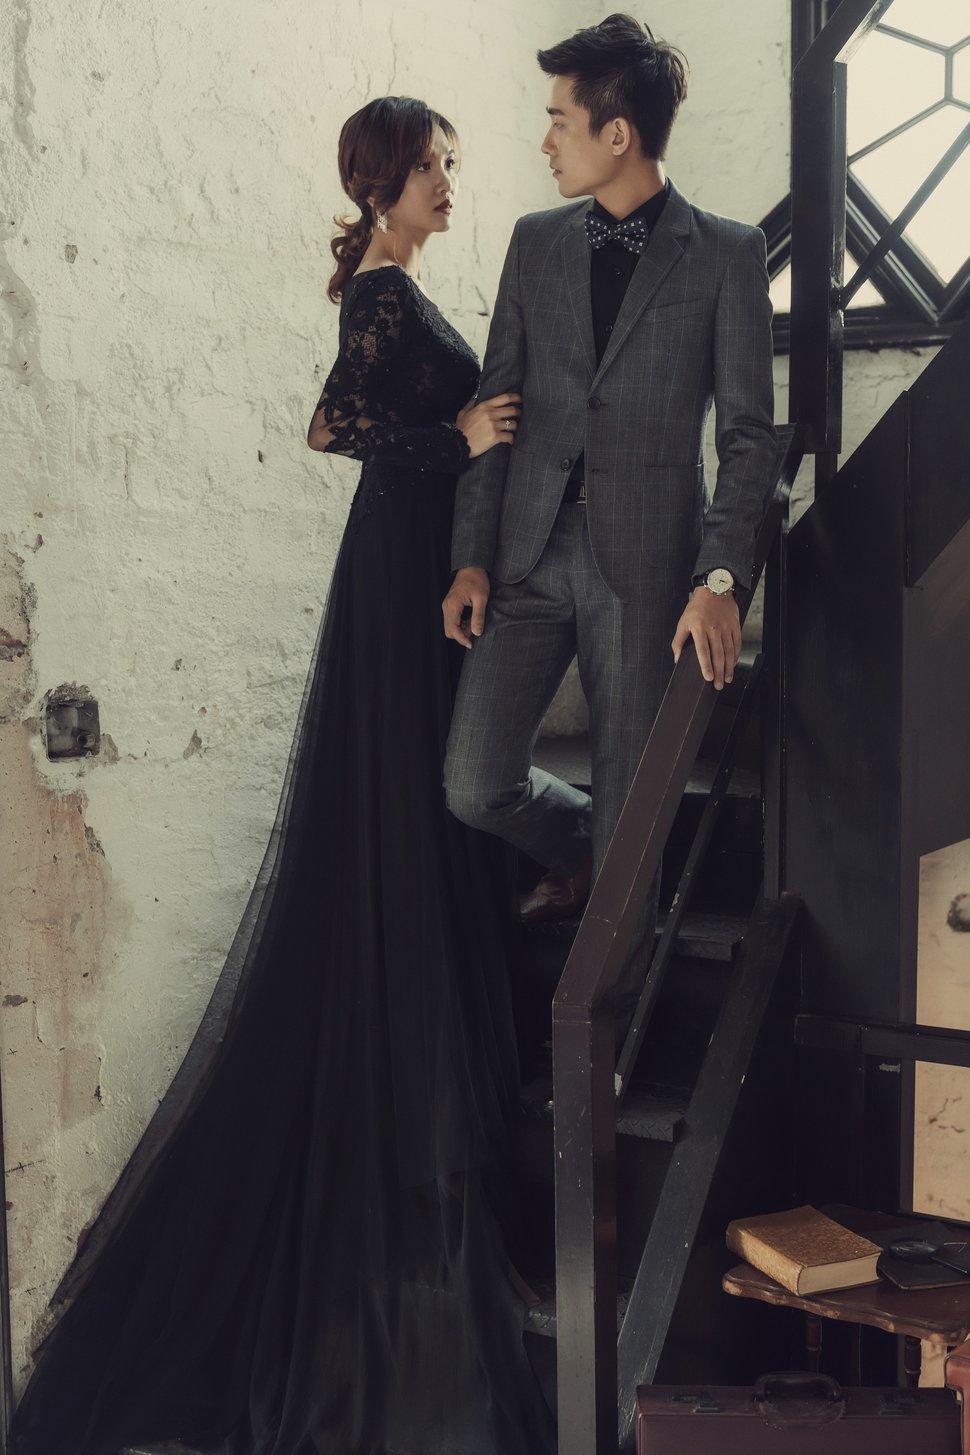 Khalil Chou(個性雜誌)-141 - Khalil Chou (凱勒·周)《結婚吧》